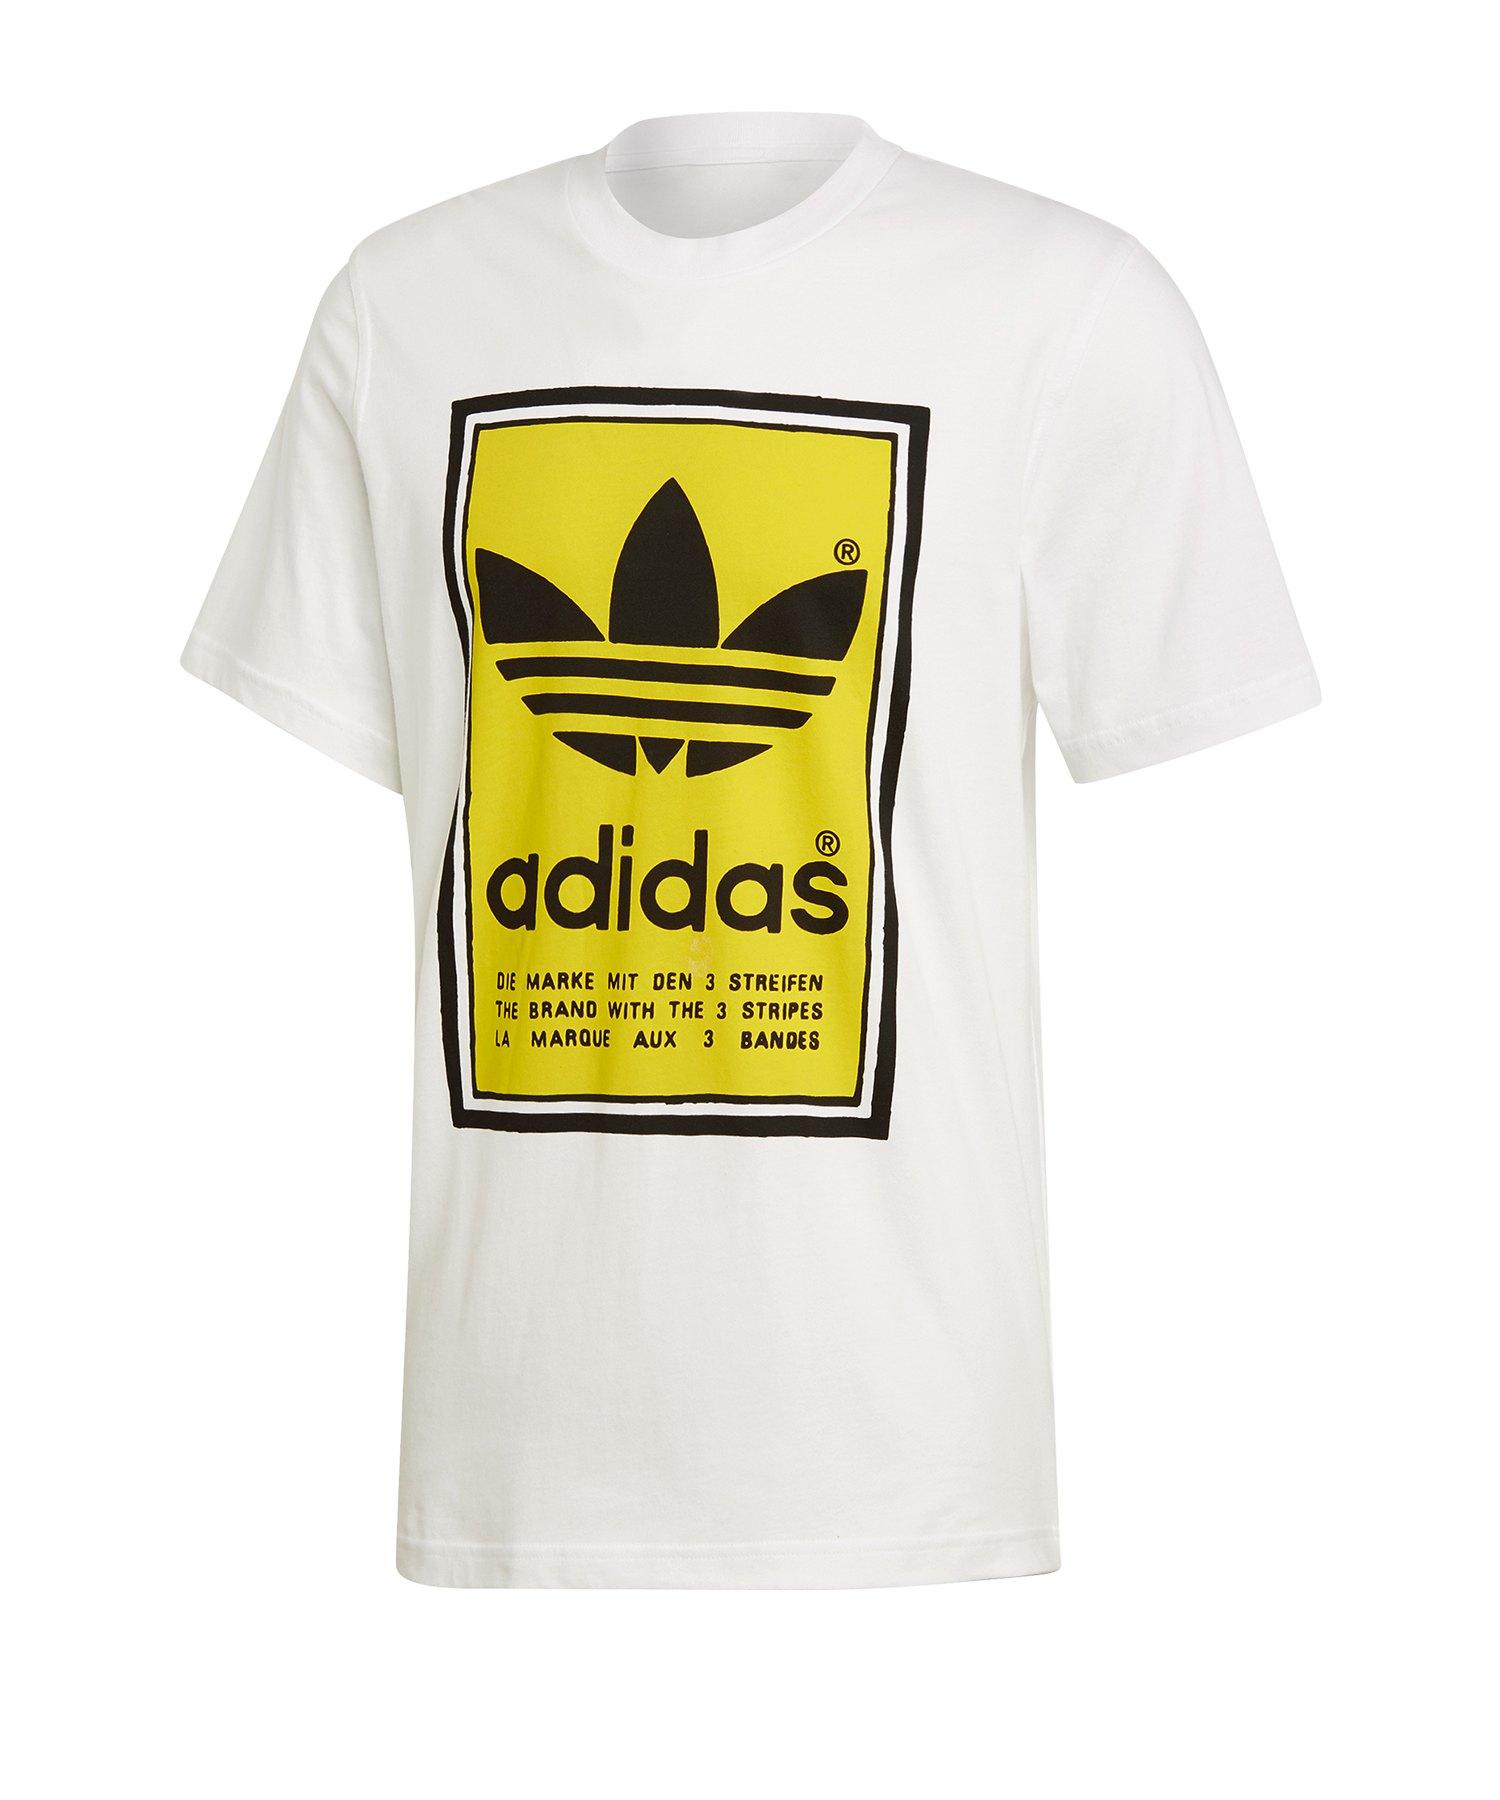 adidas planeten t shirt